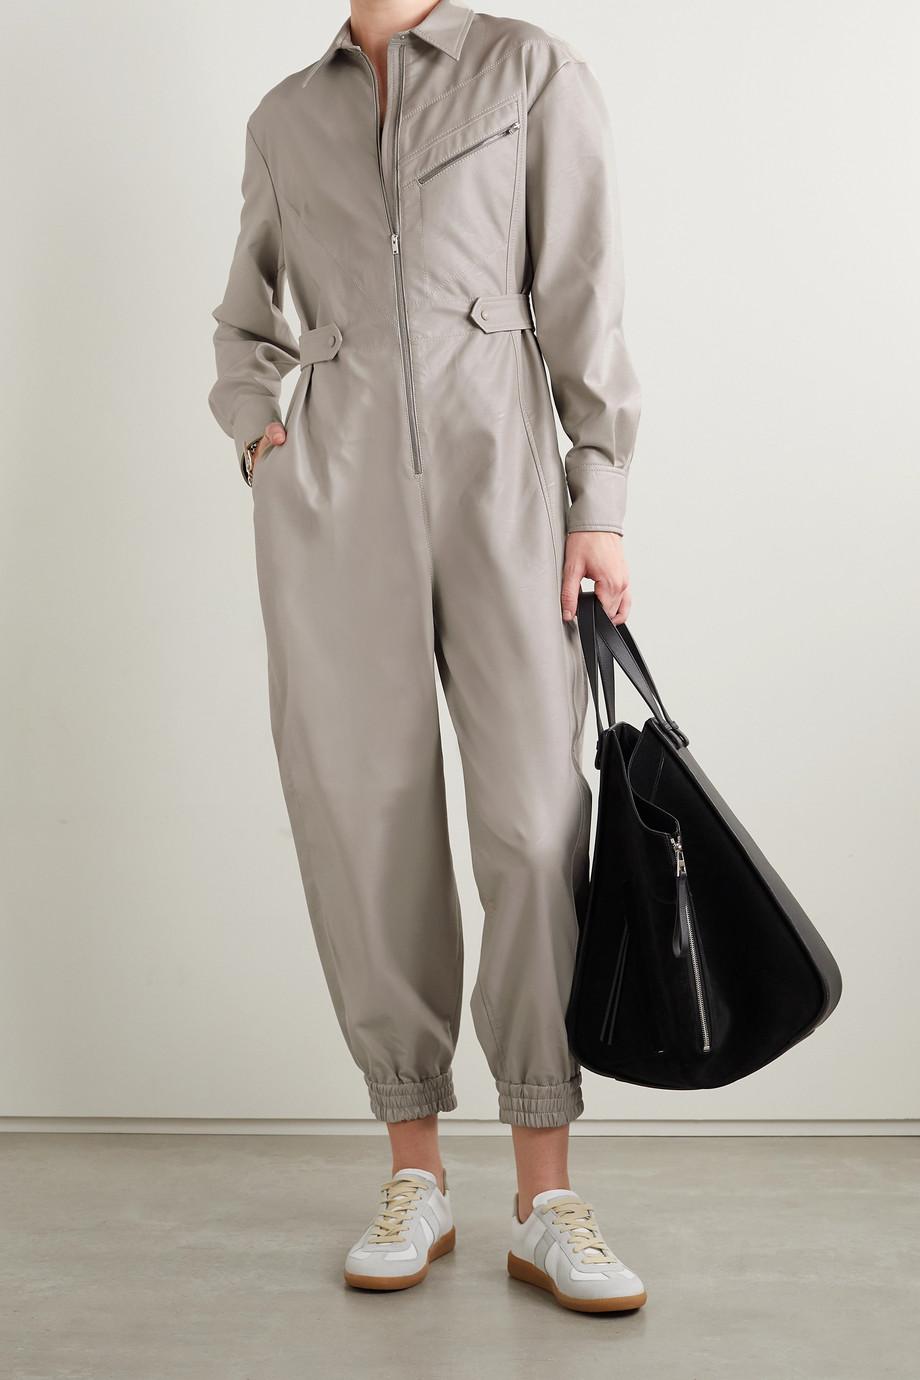 Stella McCartney Combi-pantalon en cuir végétarien Mira